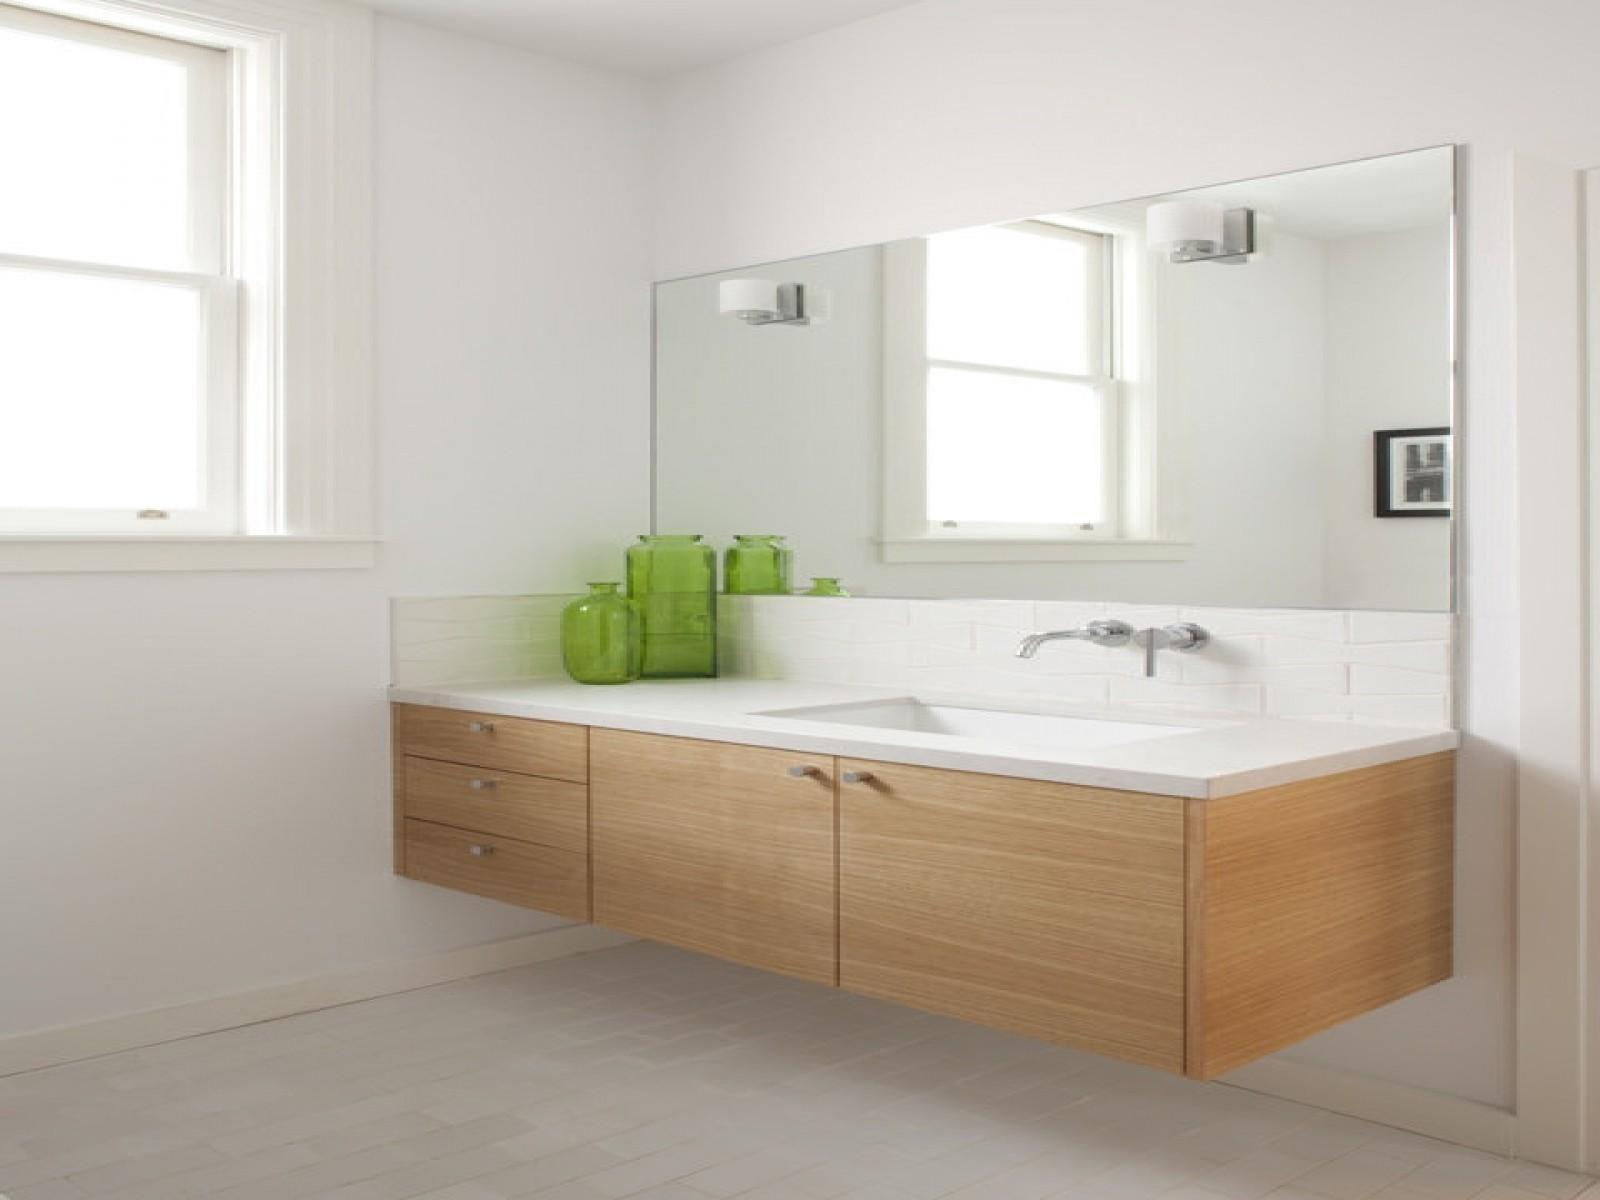 attractive-bathroom-vanity-top-ideas-2-modern-floating-bathroom ...